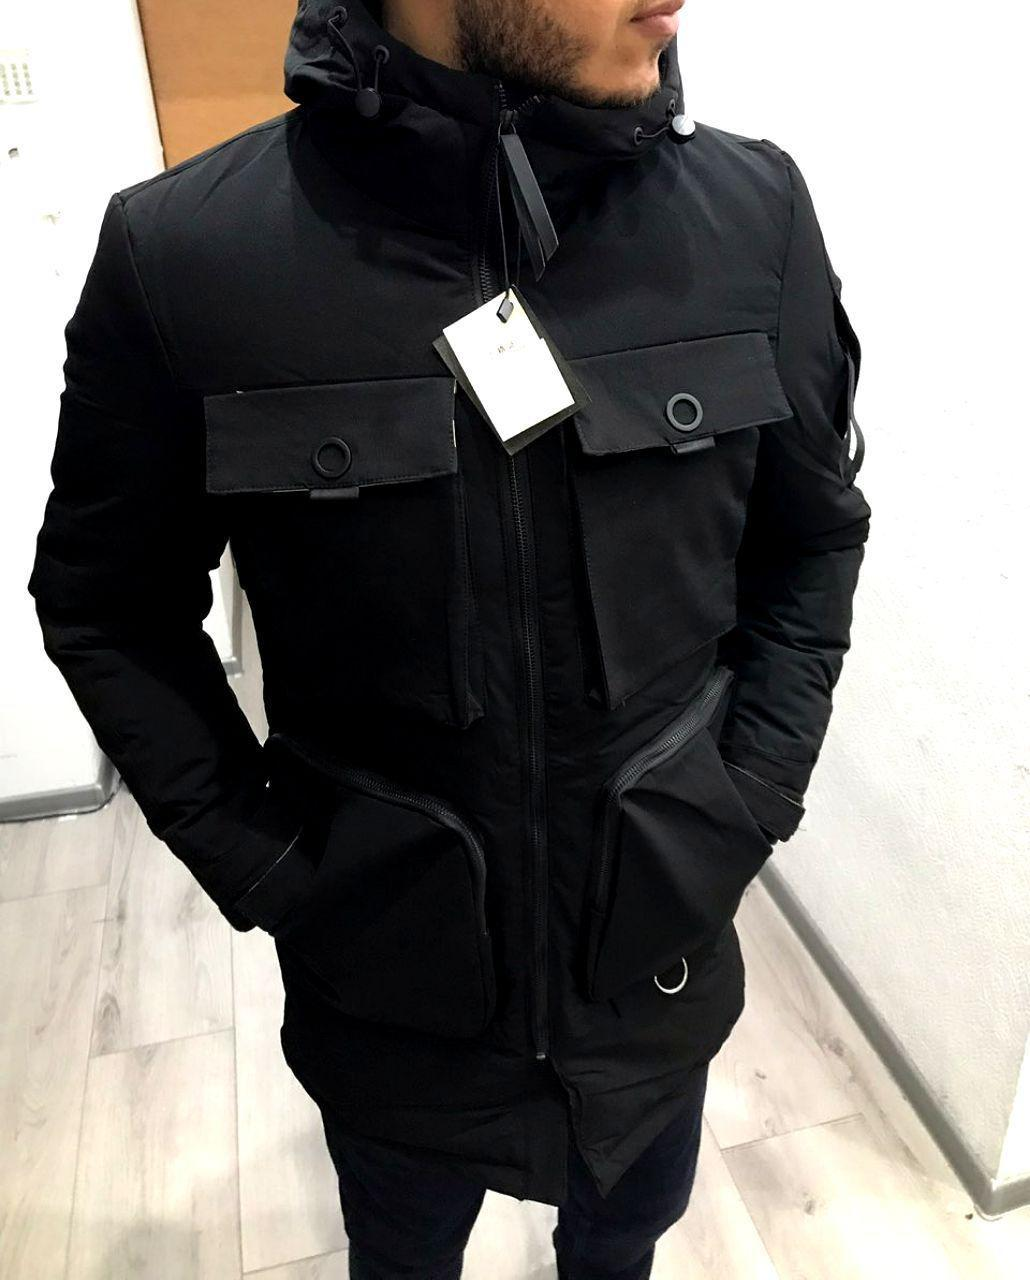 f0611f104dba Мужская куртка зимняя Бренд, до -25,Турция, с,м,л,хл,ххл.хххл, тинсулейт  Шикарное ...